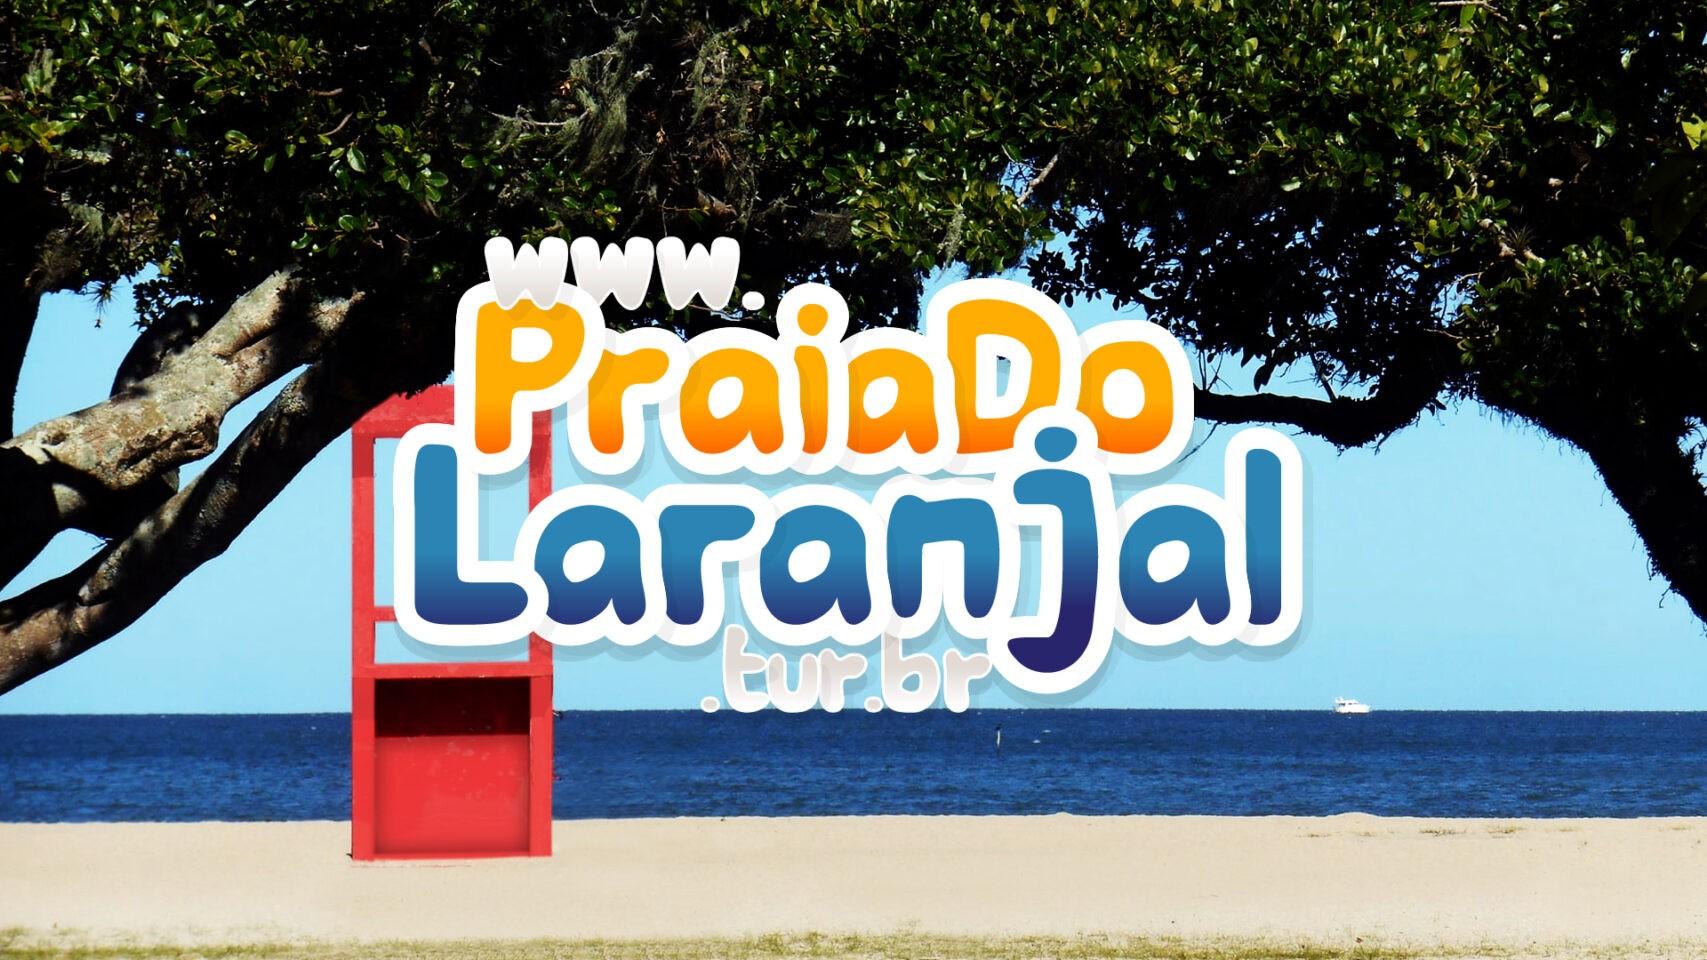 Portal Praia do Laranjal - www.PraiaDoLaranjal.tur.br